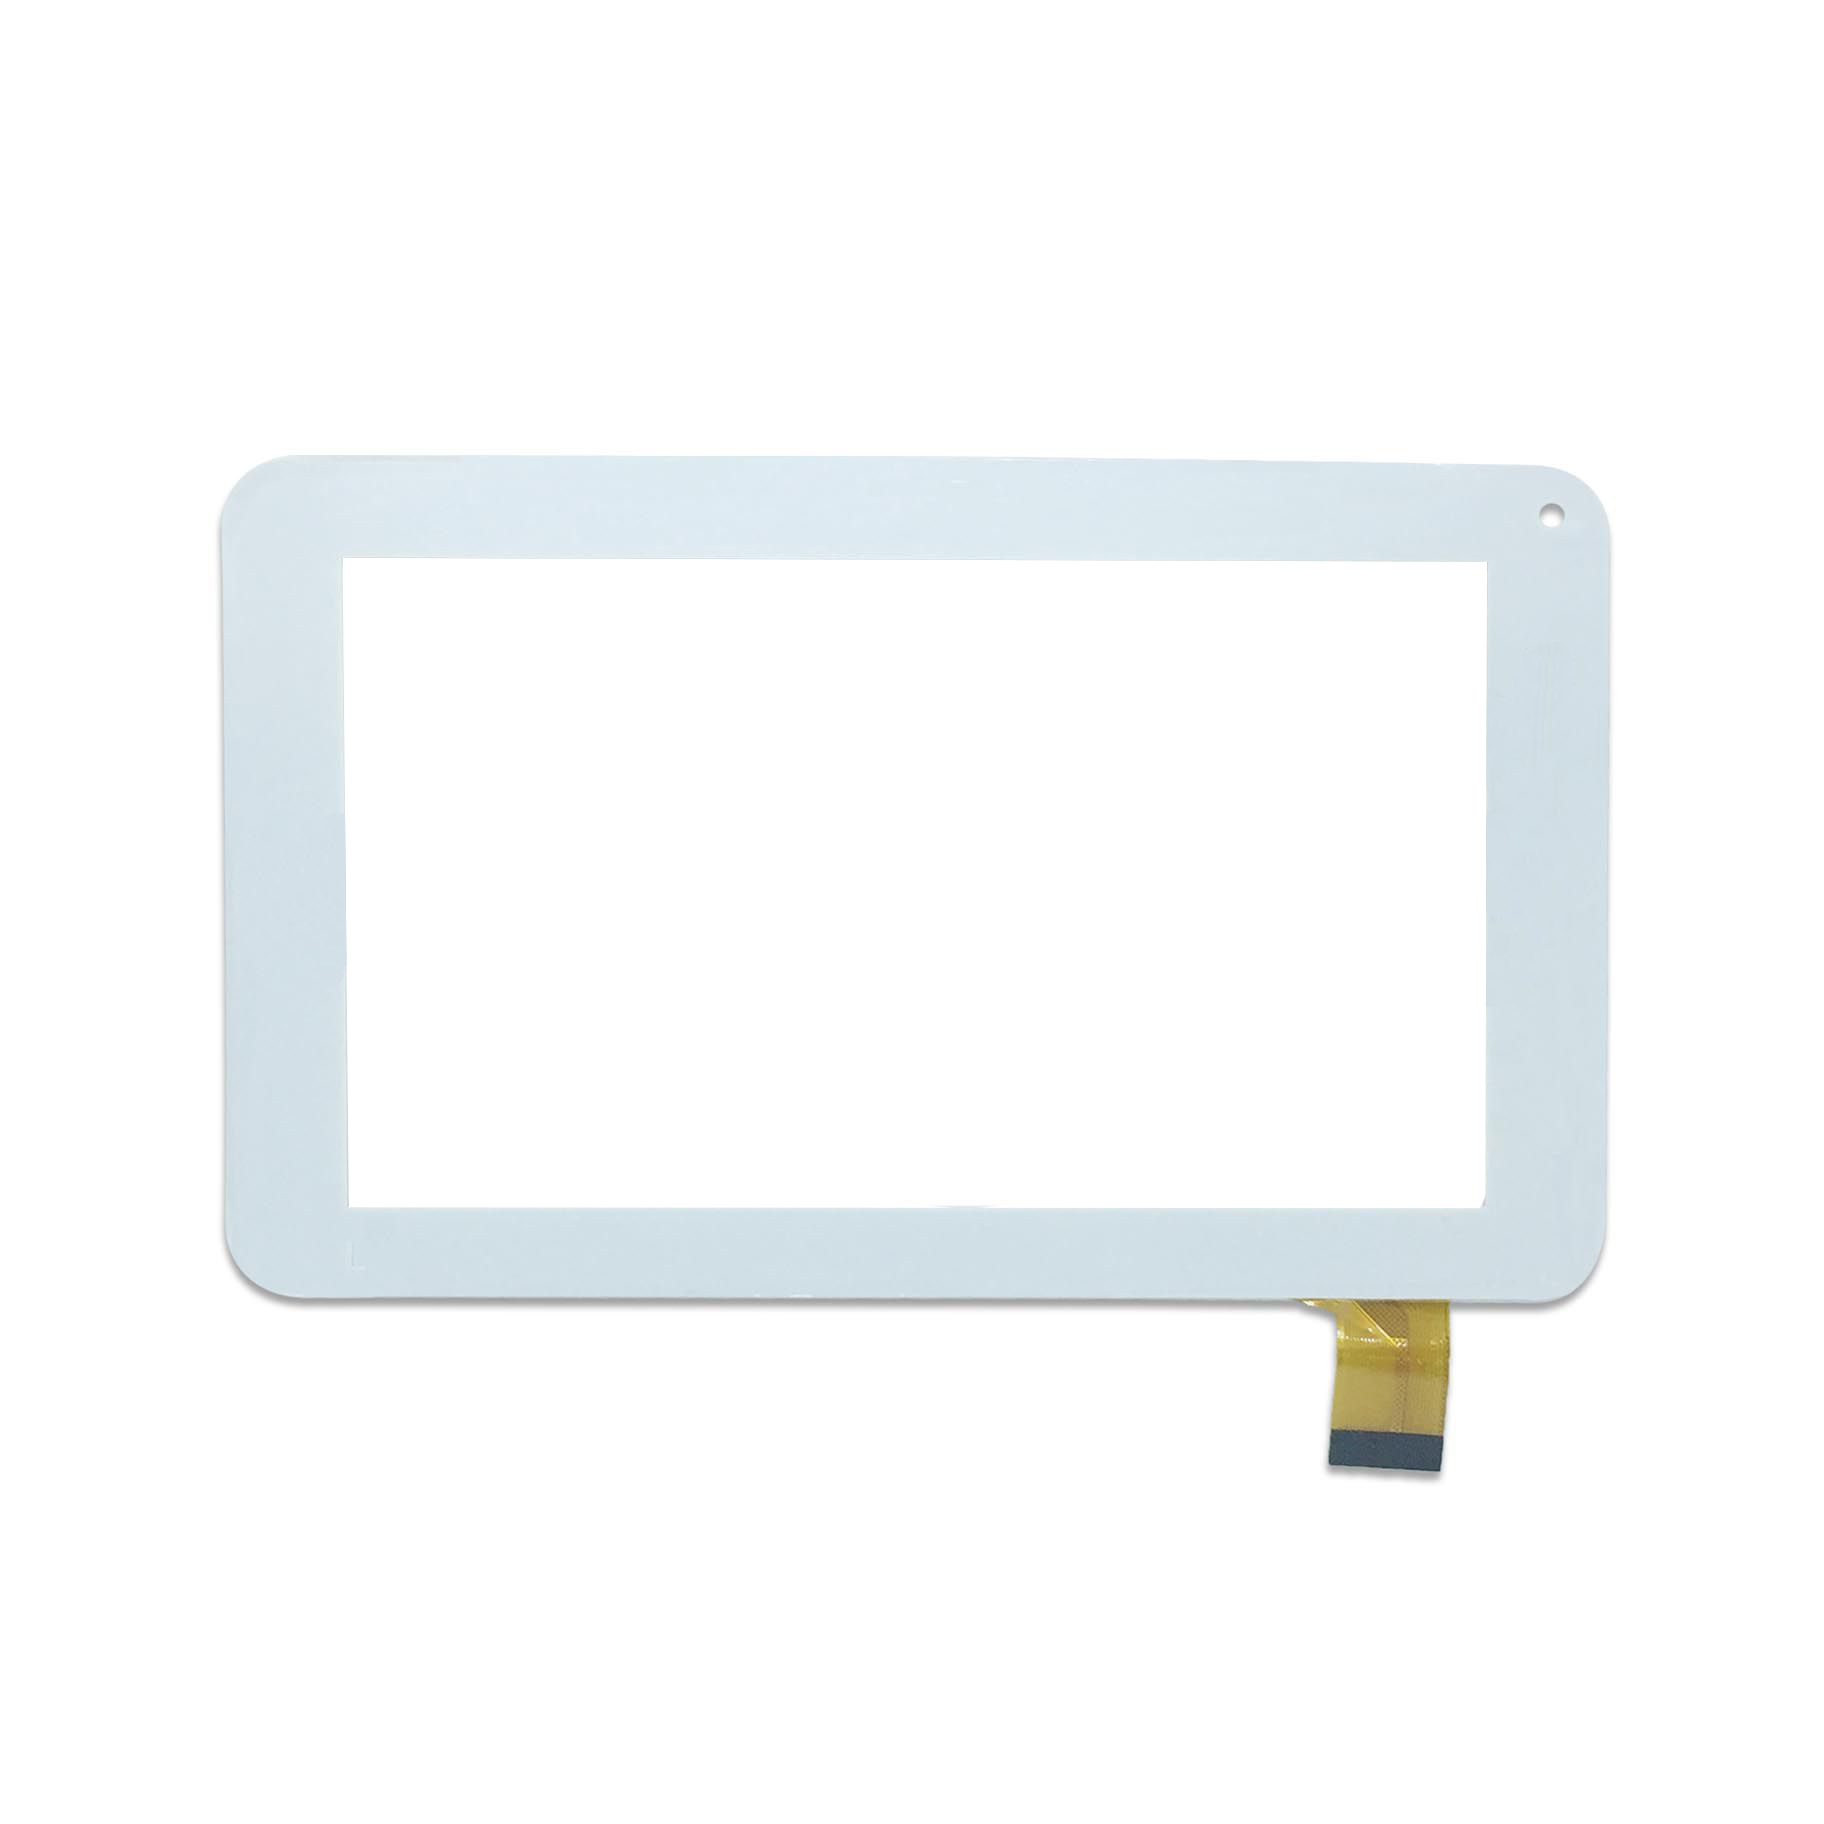 Tela Touch Dl Tp101 Bra L350 Branco